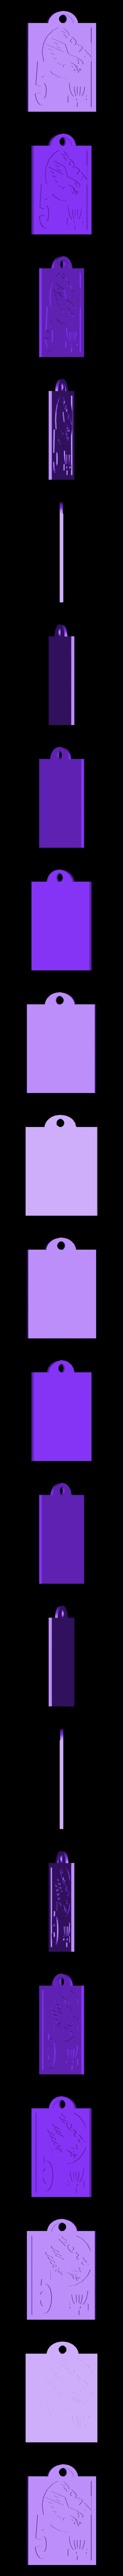 Disc_Bag_Tag_5.stl Download free STL file Disc Golf Bag Tag • 3D print design, mrhers2